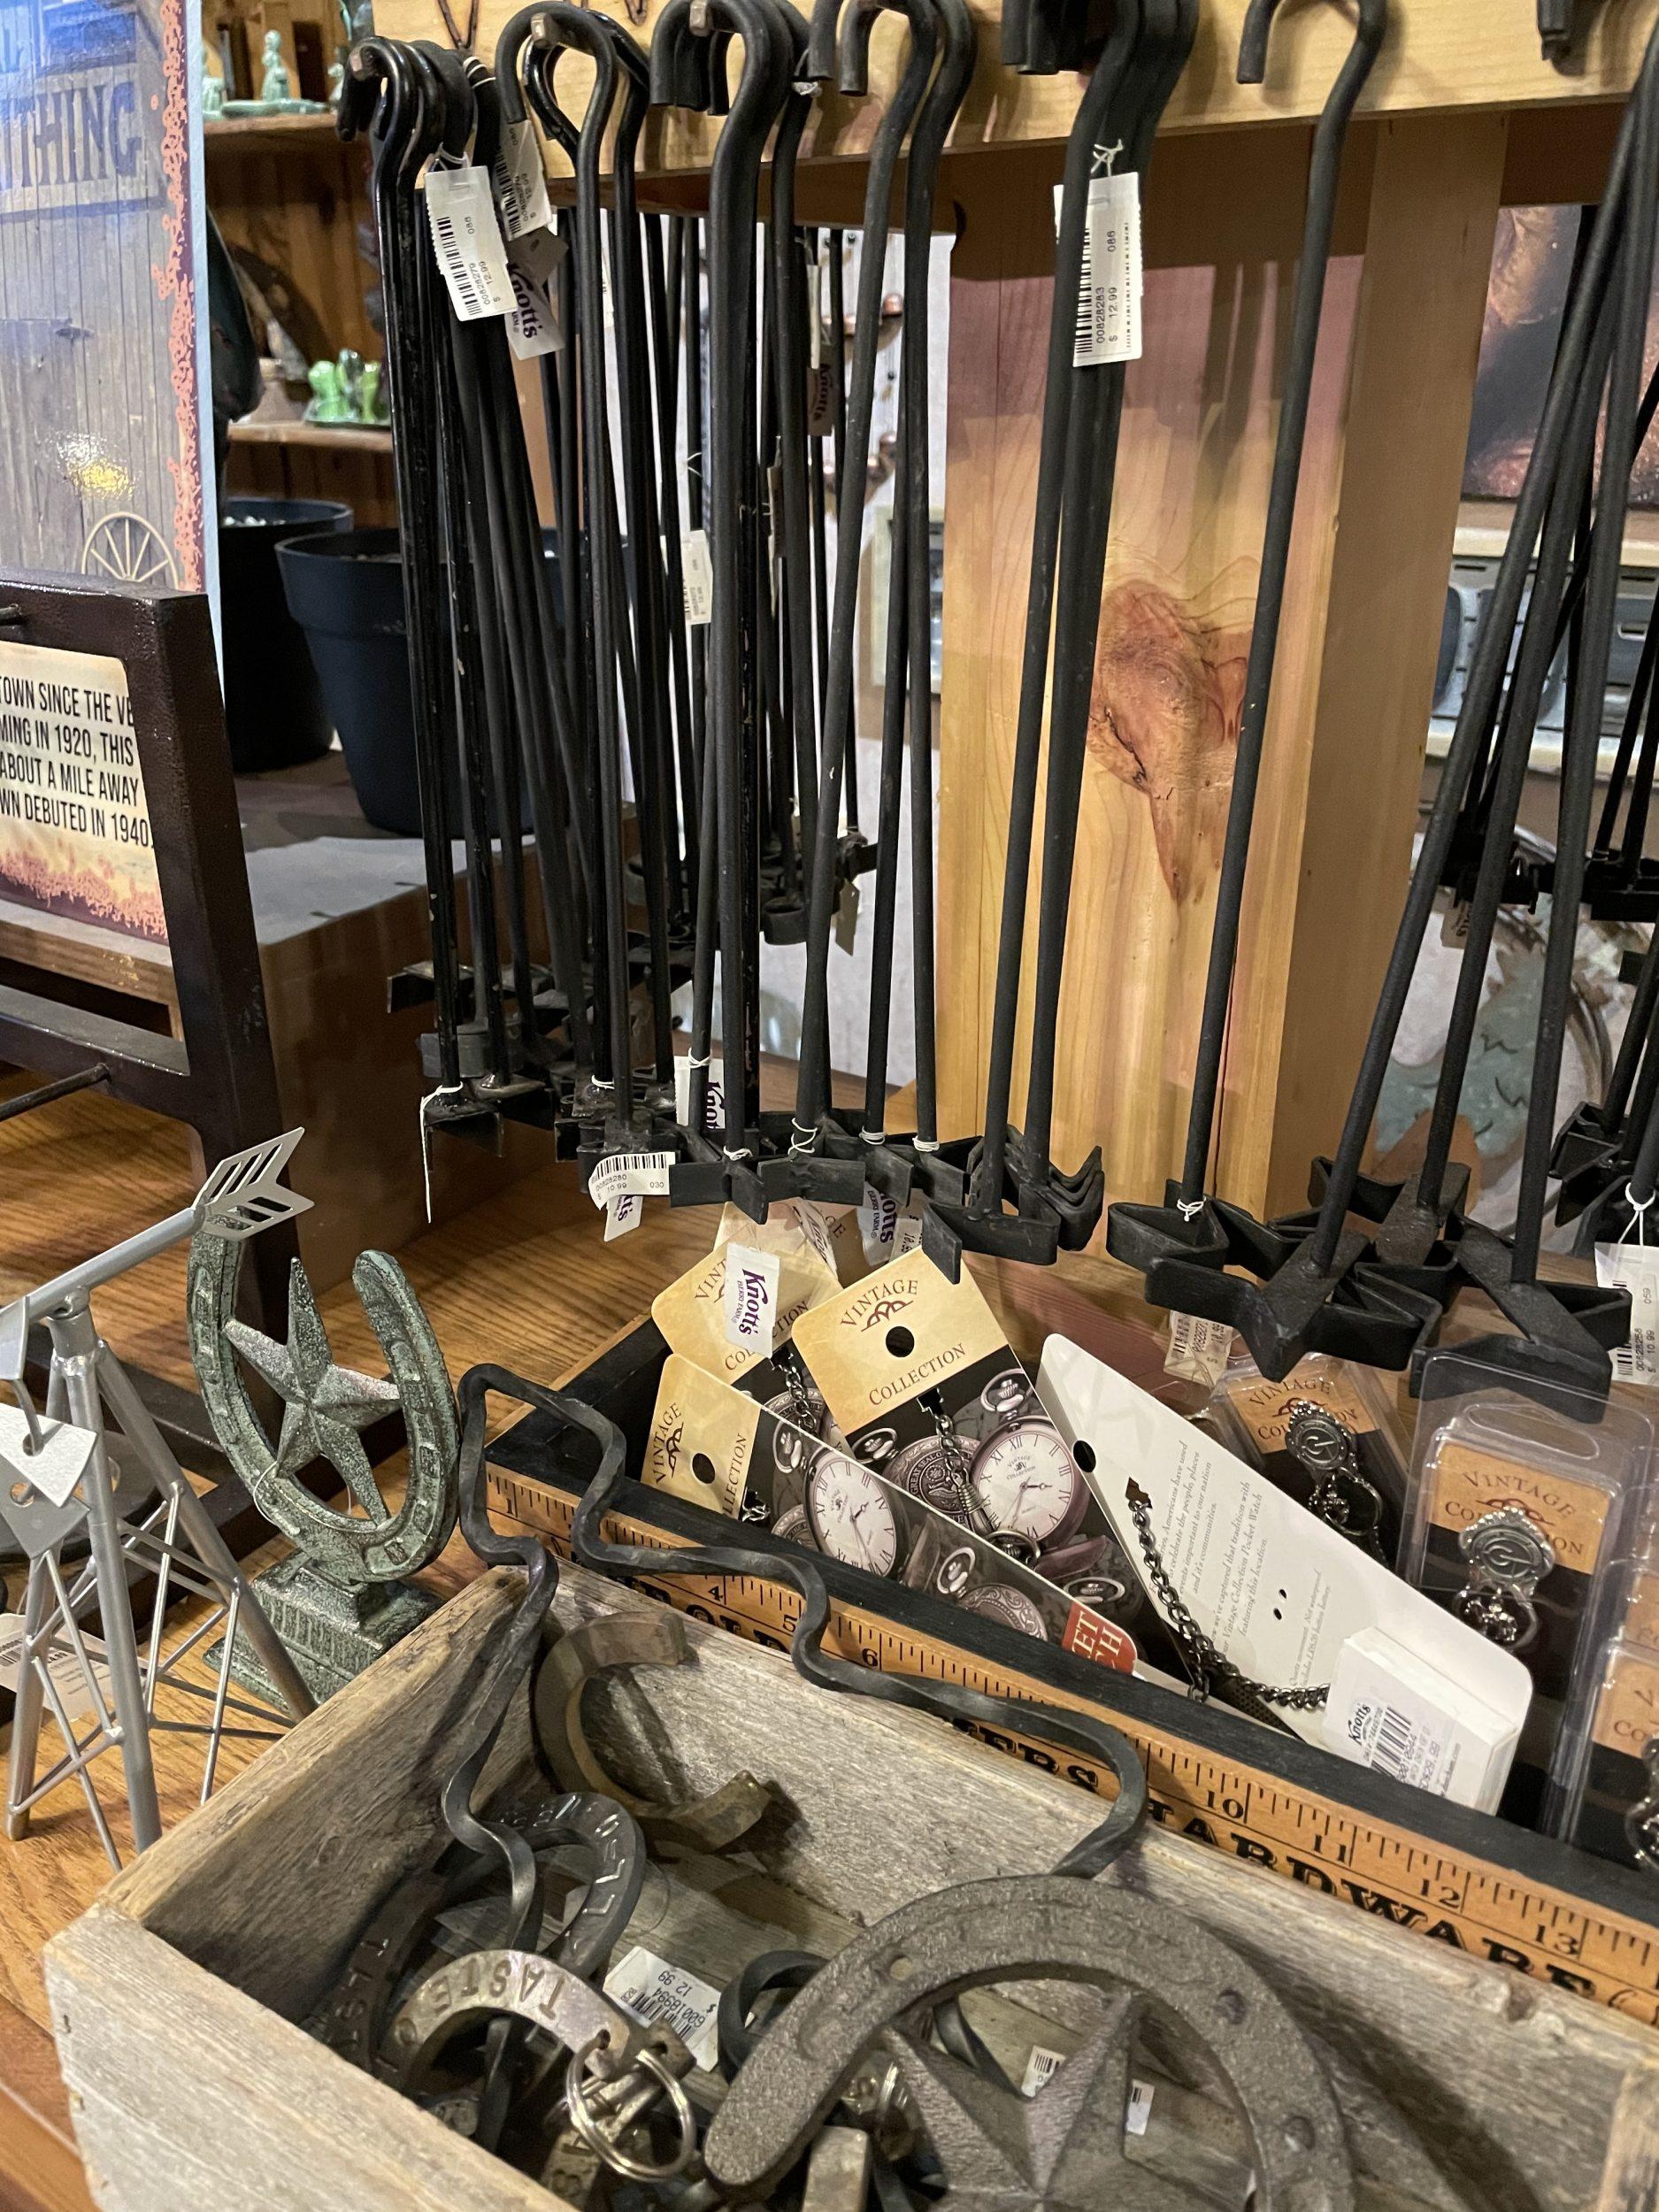 Branding irons made by Knott's Berry Farm blacksmith